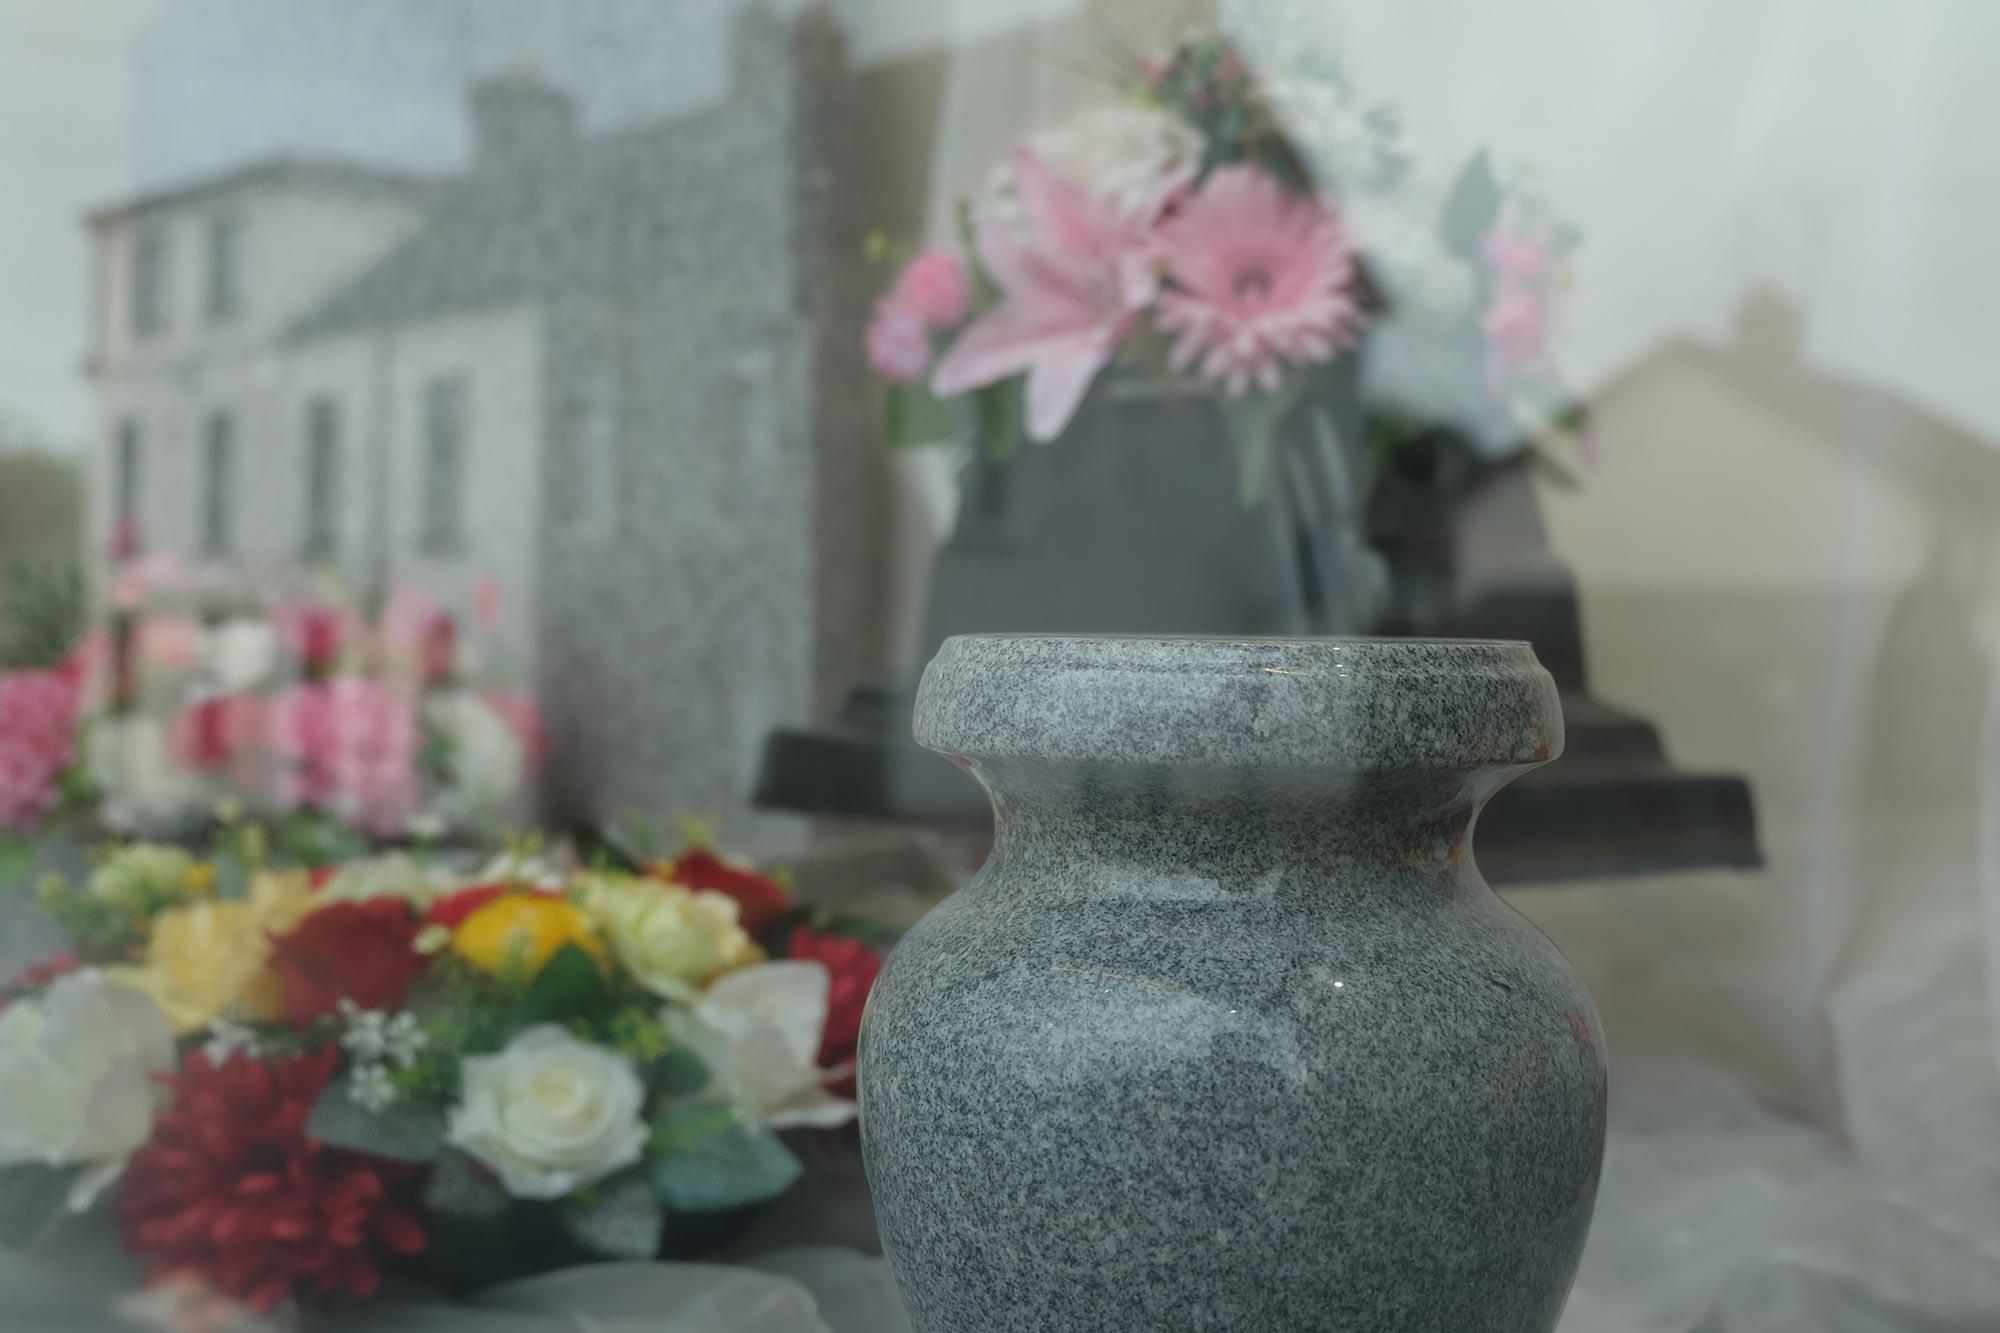 Urns and floral arrangements